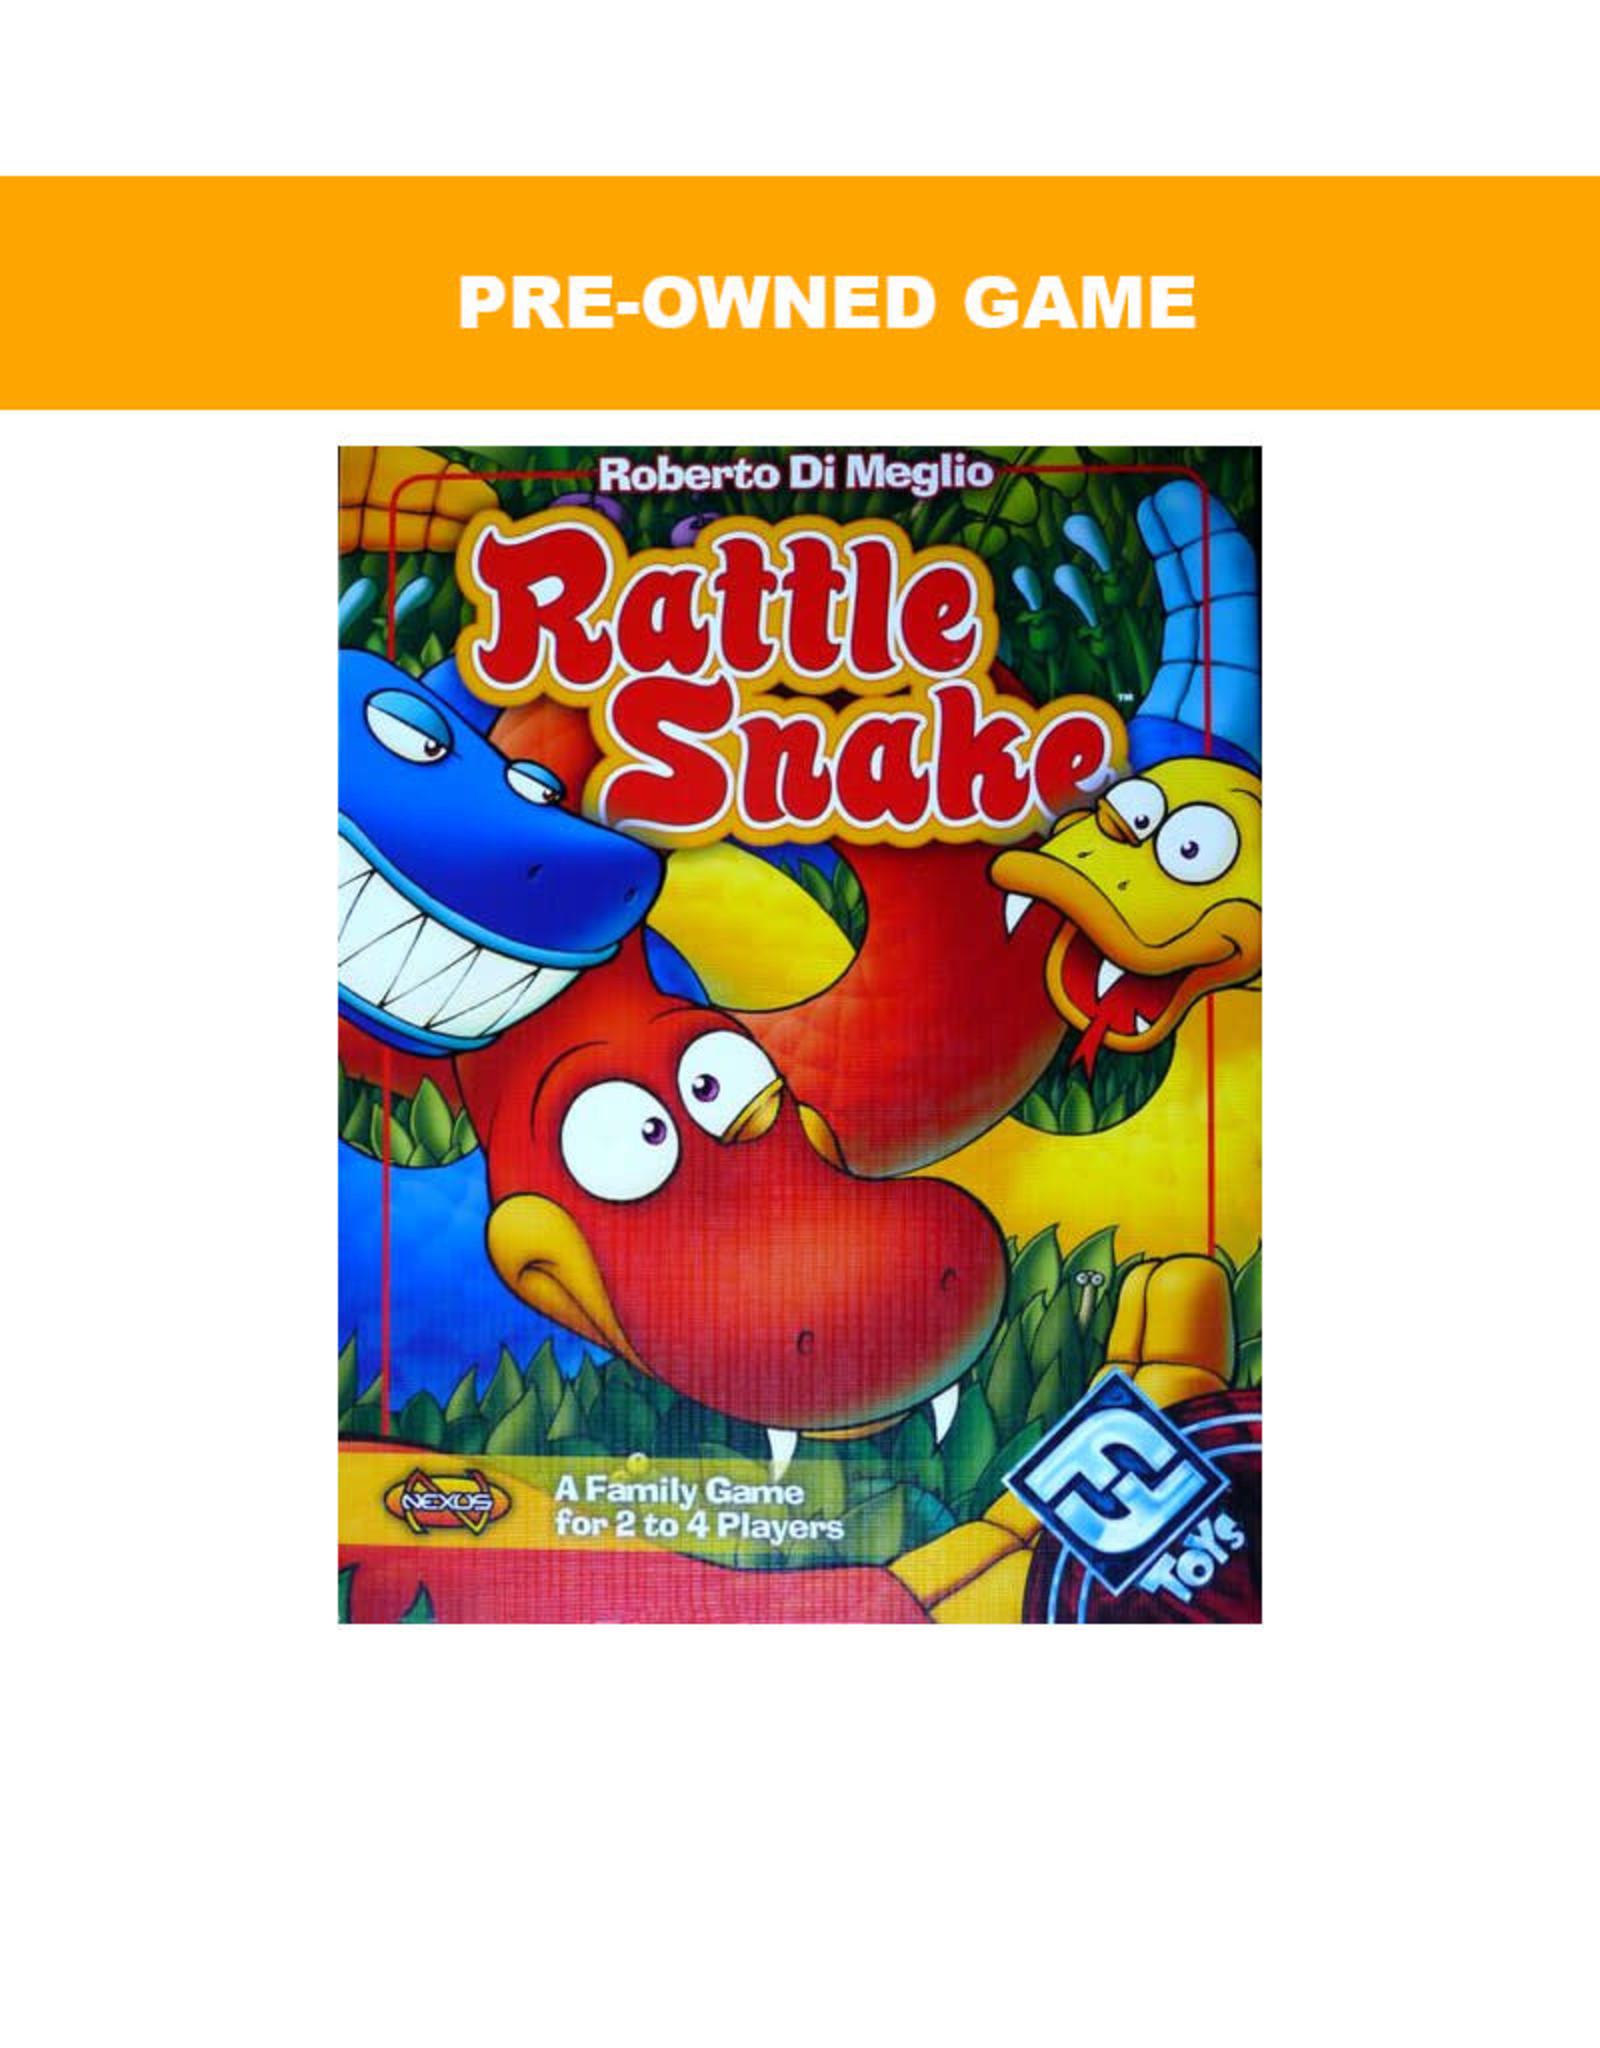 Game Night Games (Pre-Owned Game) RattleSnake